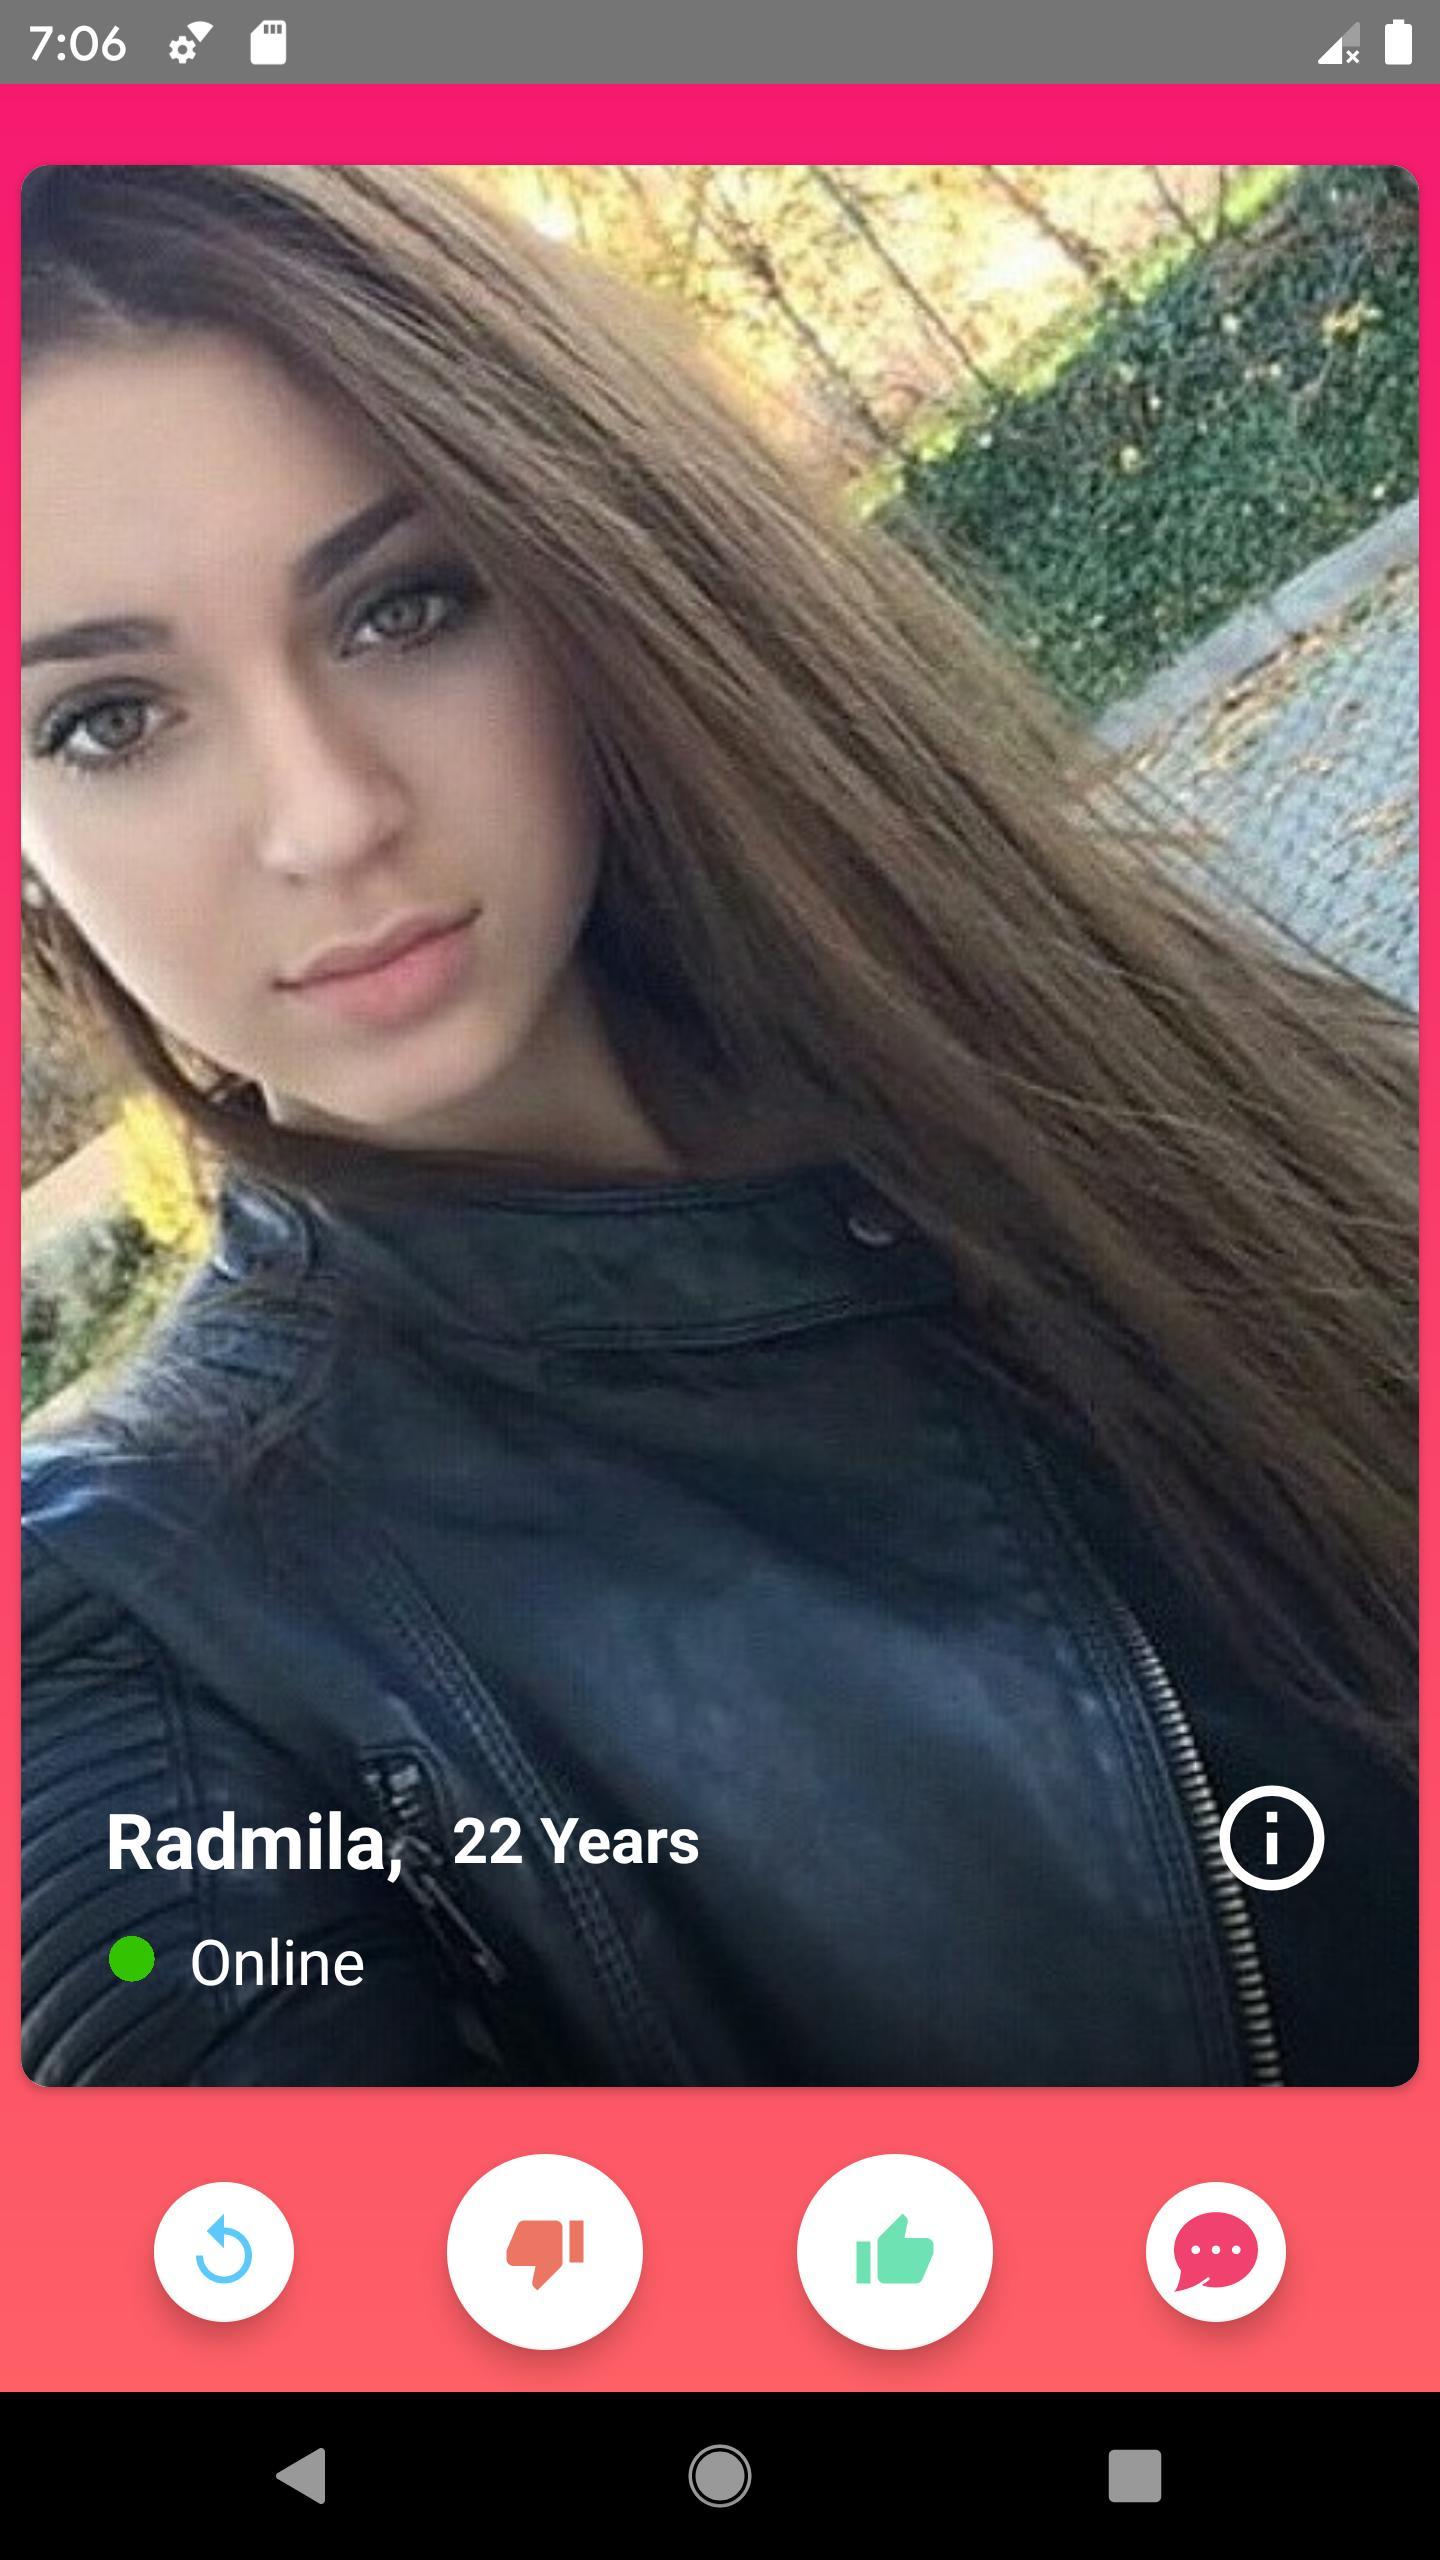 Samac online dating u blizini Rijeka Hrvatska